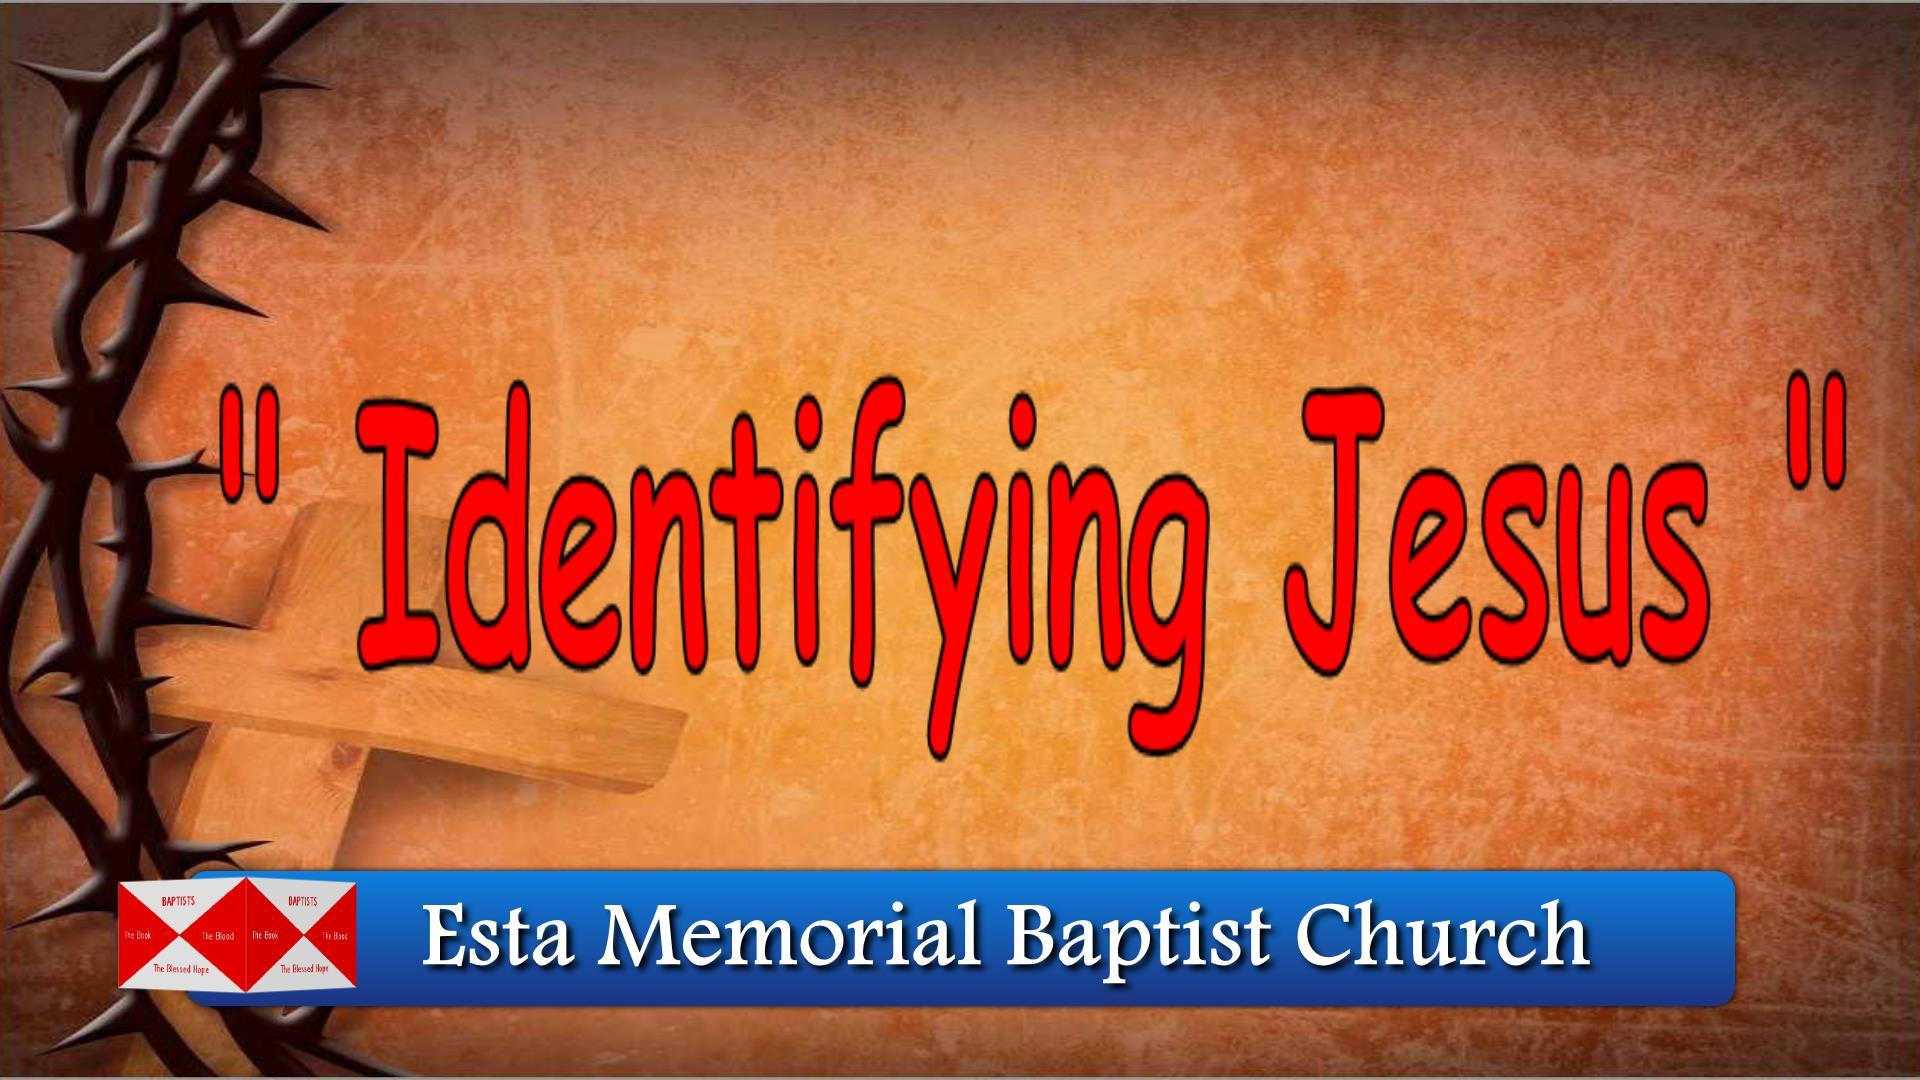 Identifying Jesus